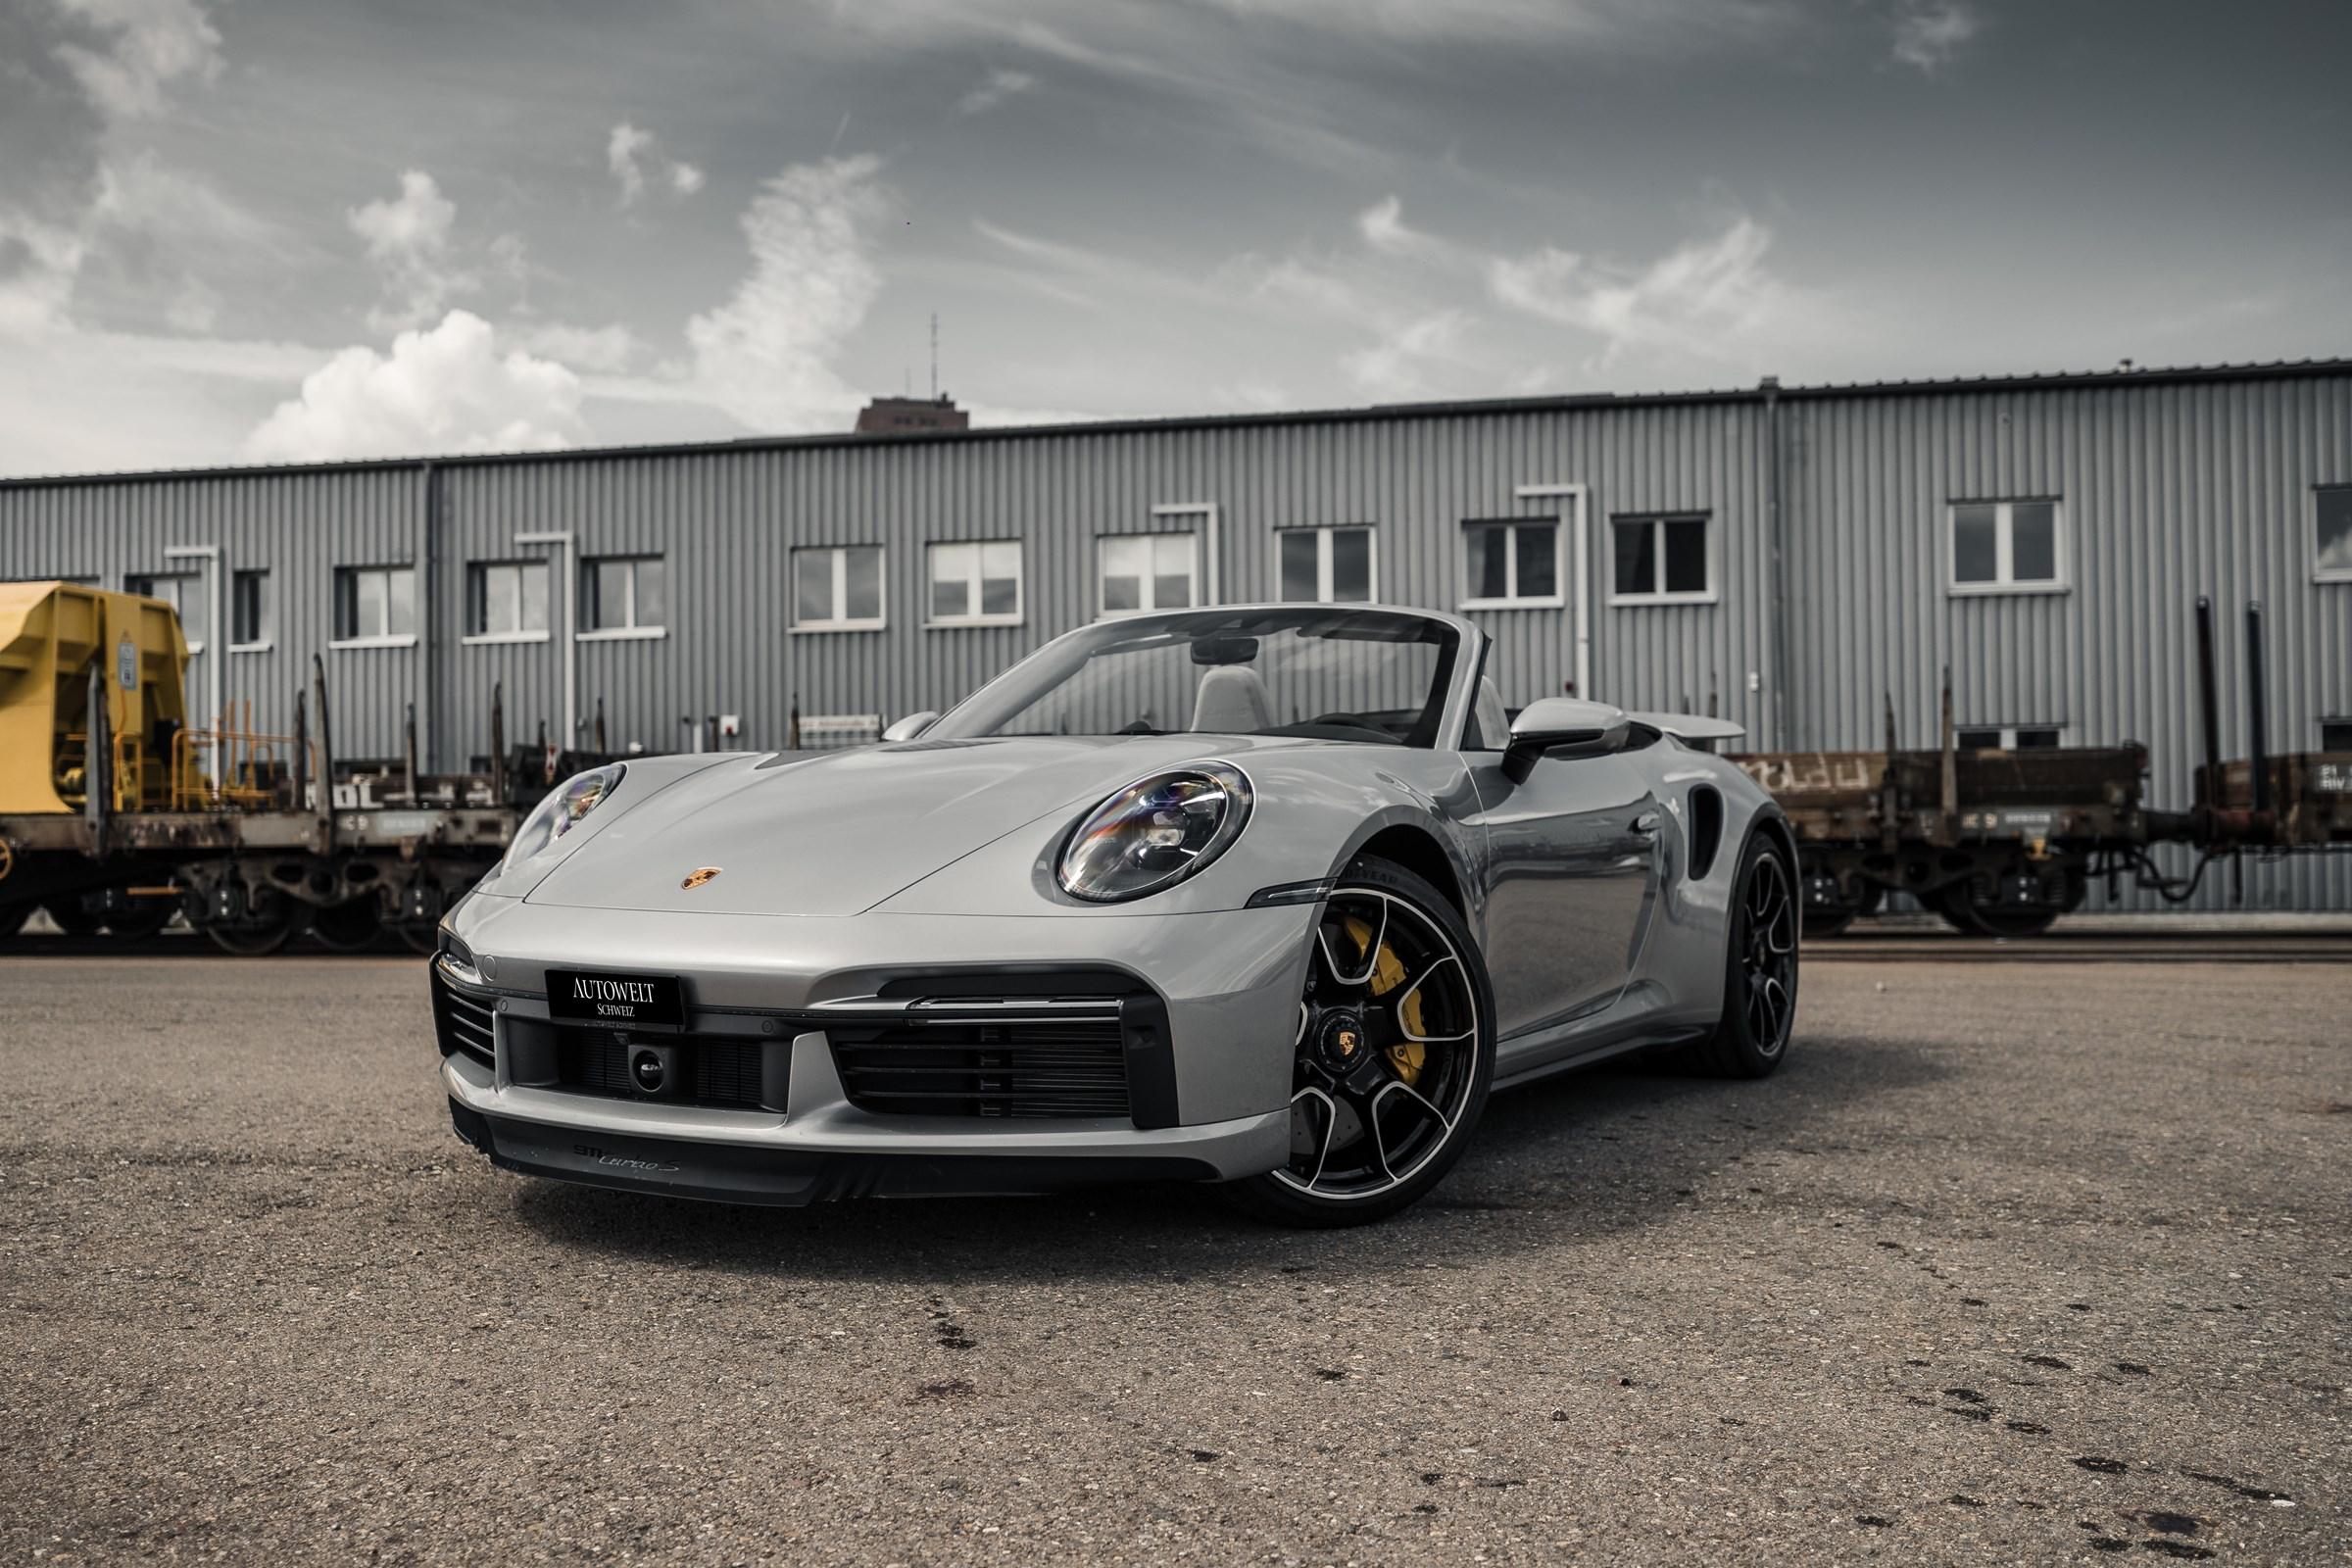 cabriolet Porsche 911 Turbo S Cabriolet PDK